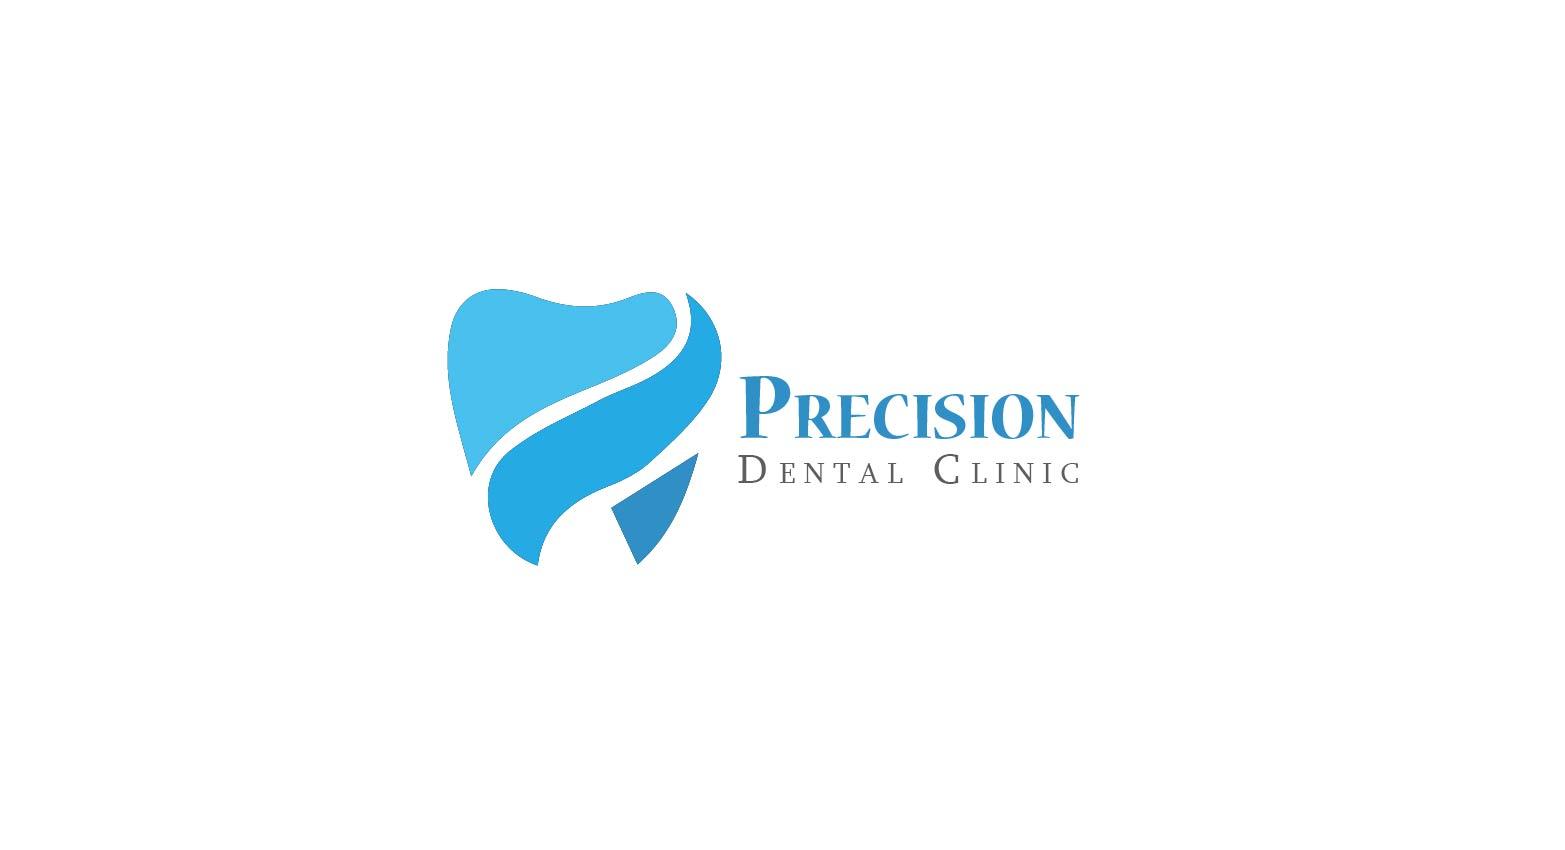 Logo Design by Muazzama Memon - Entry No. 165 in the Logo Design Contest Captivating Logo Design for Precision Dental Clinic.